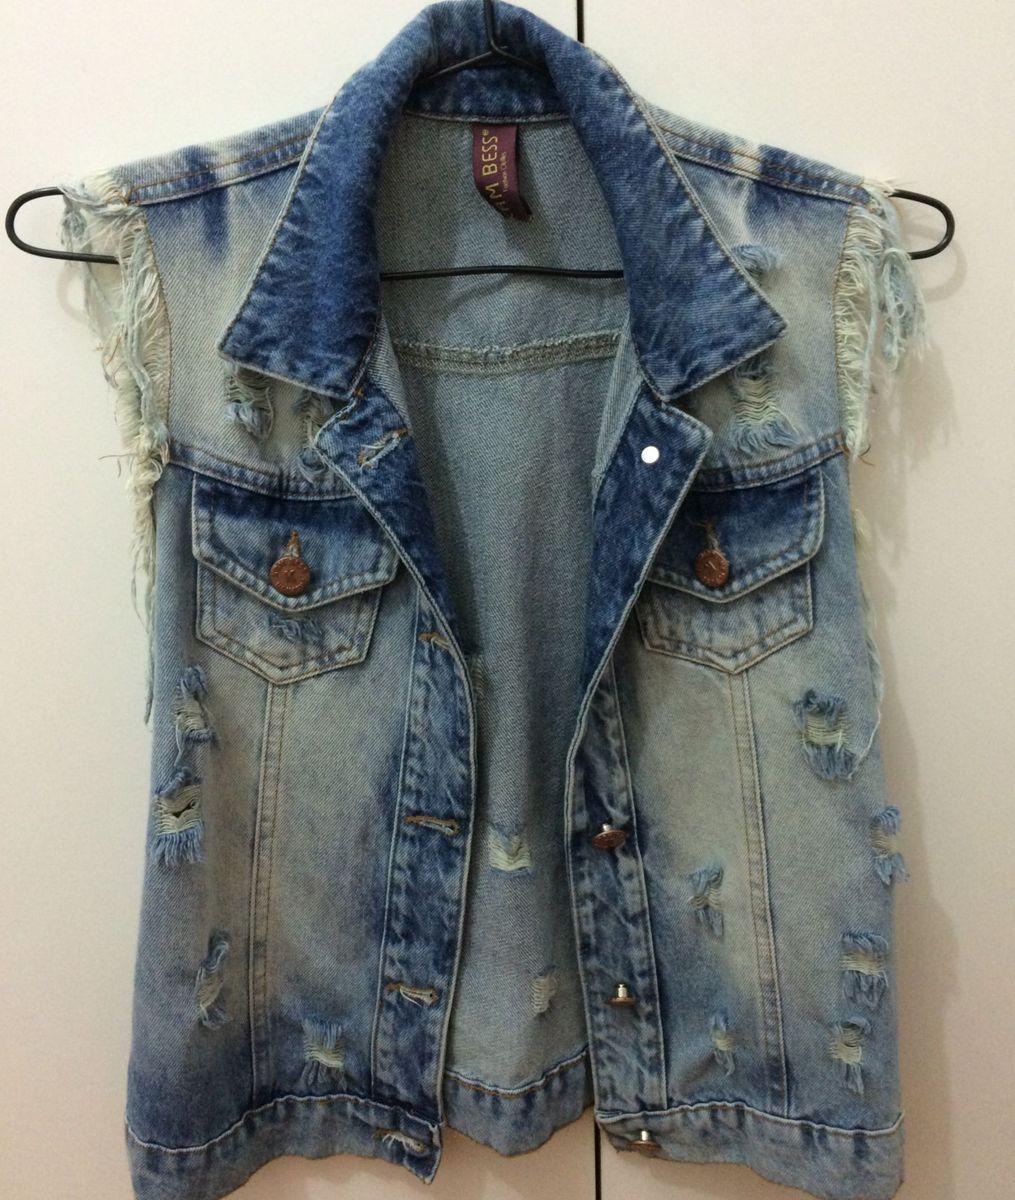 6b2f0a9ac020 colete jeans rasgado - coletes kambess.  Czm6ly9wag90b3muzw5qb2vplmnvbs5ici9wcm9kdwn0cy84nteymjgvyze5mzvkztdjmme4odmxogvlngq2ywuxngjiyjrimdmuanbn